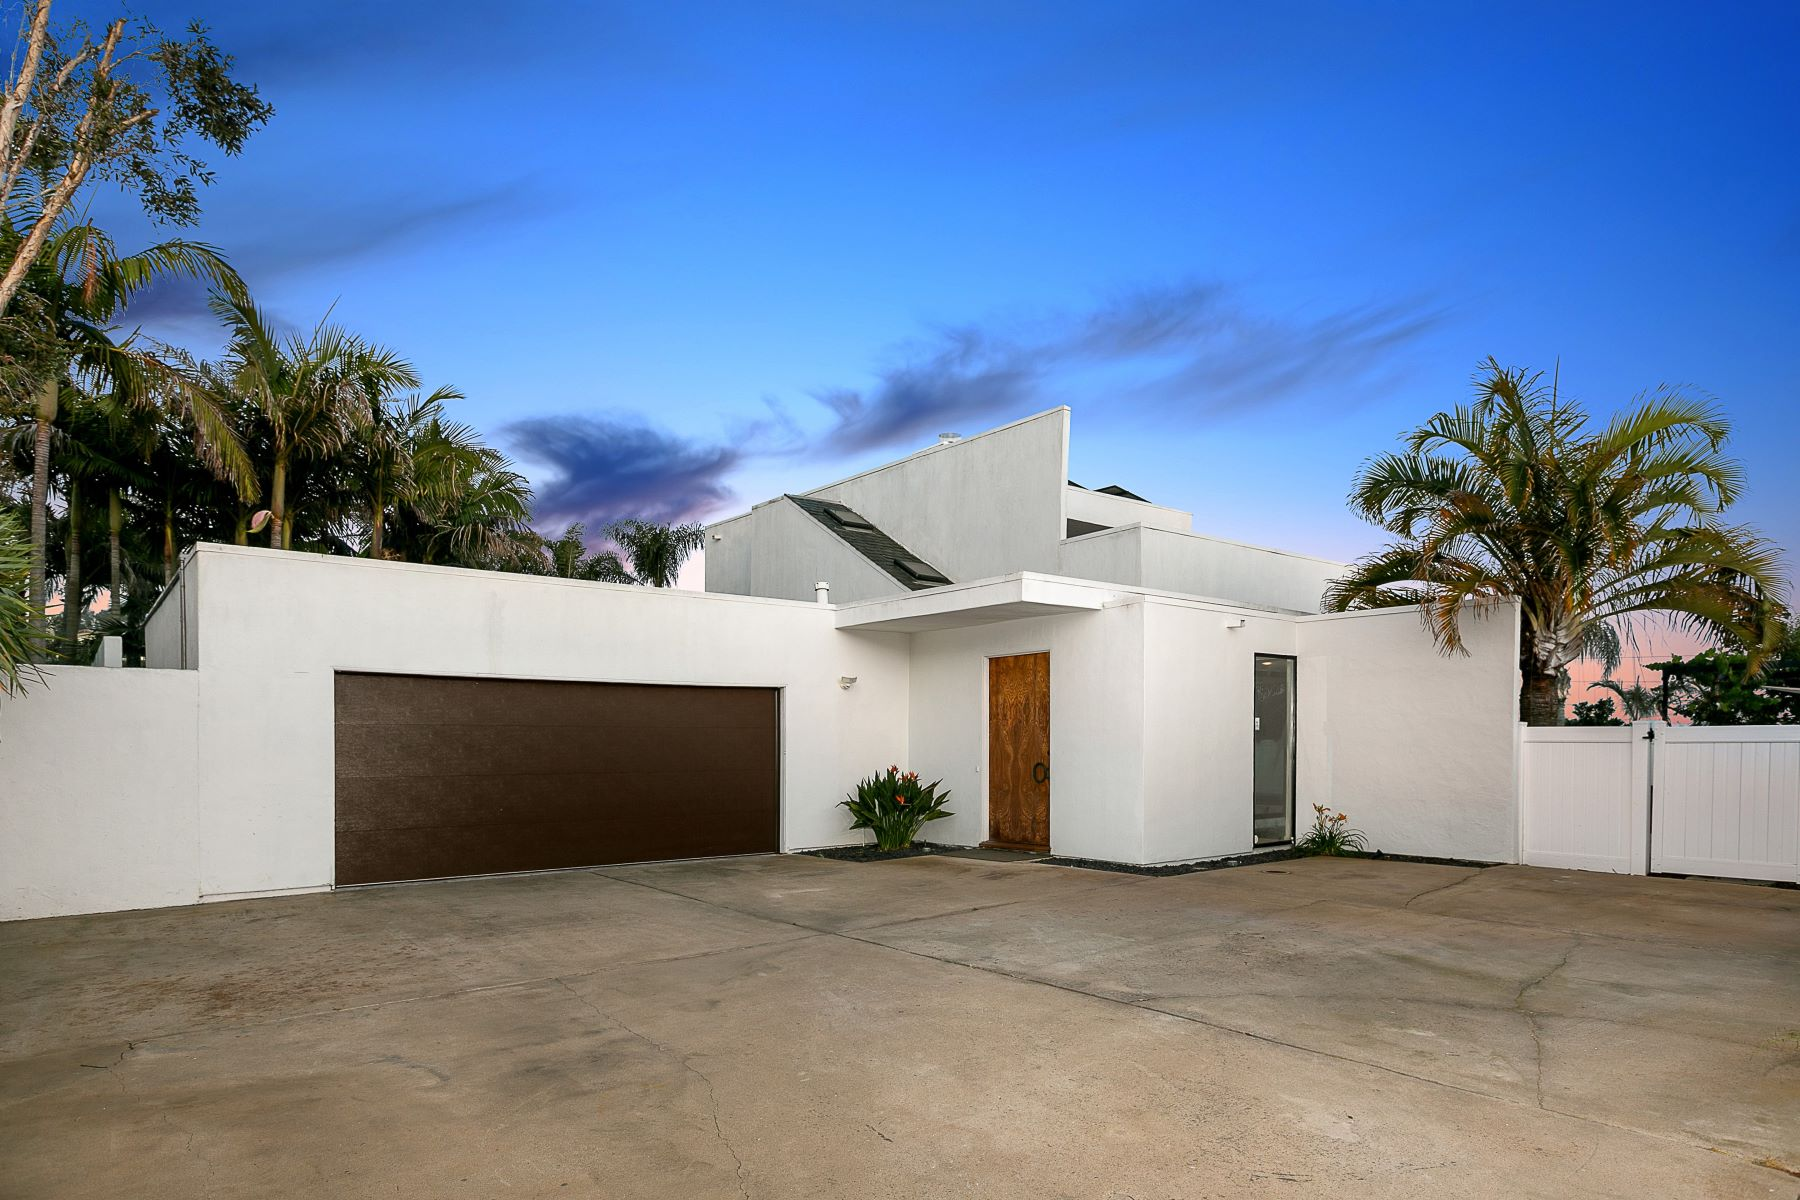 Single Family Homes for Active at 2433 Unicornio Carlsbad, California 92009 United States